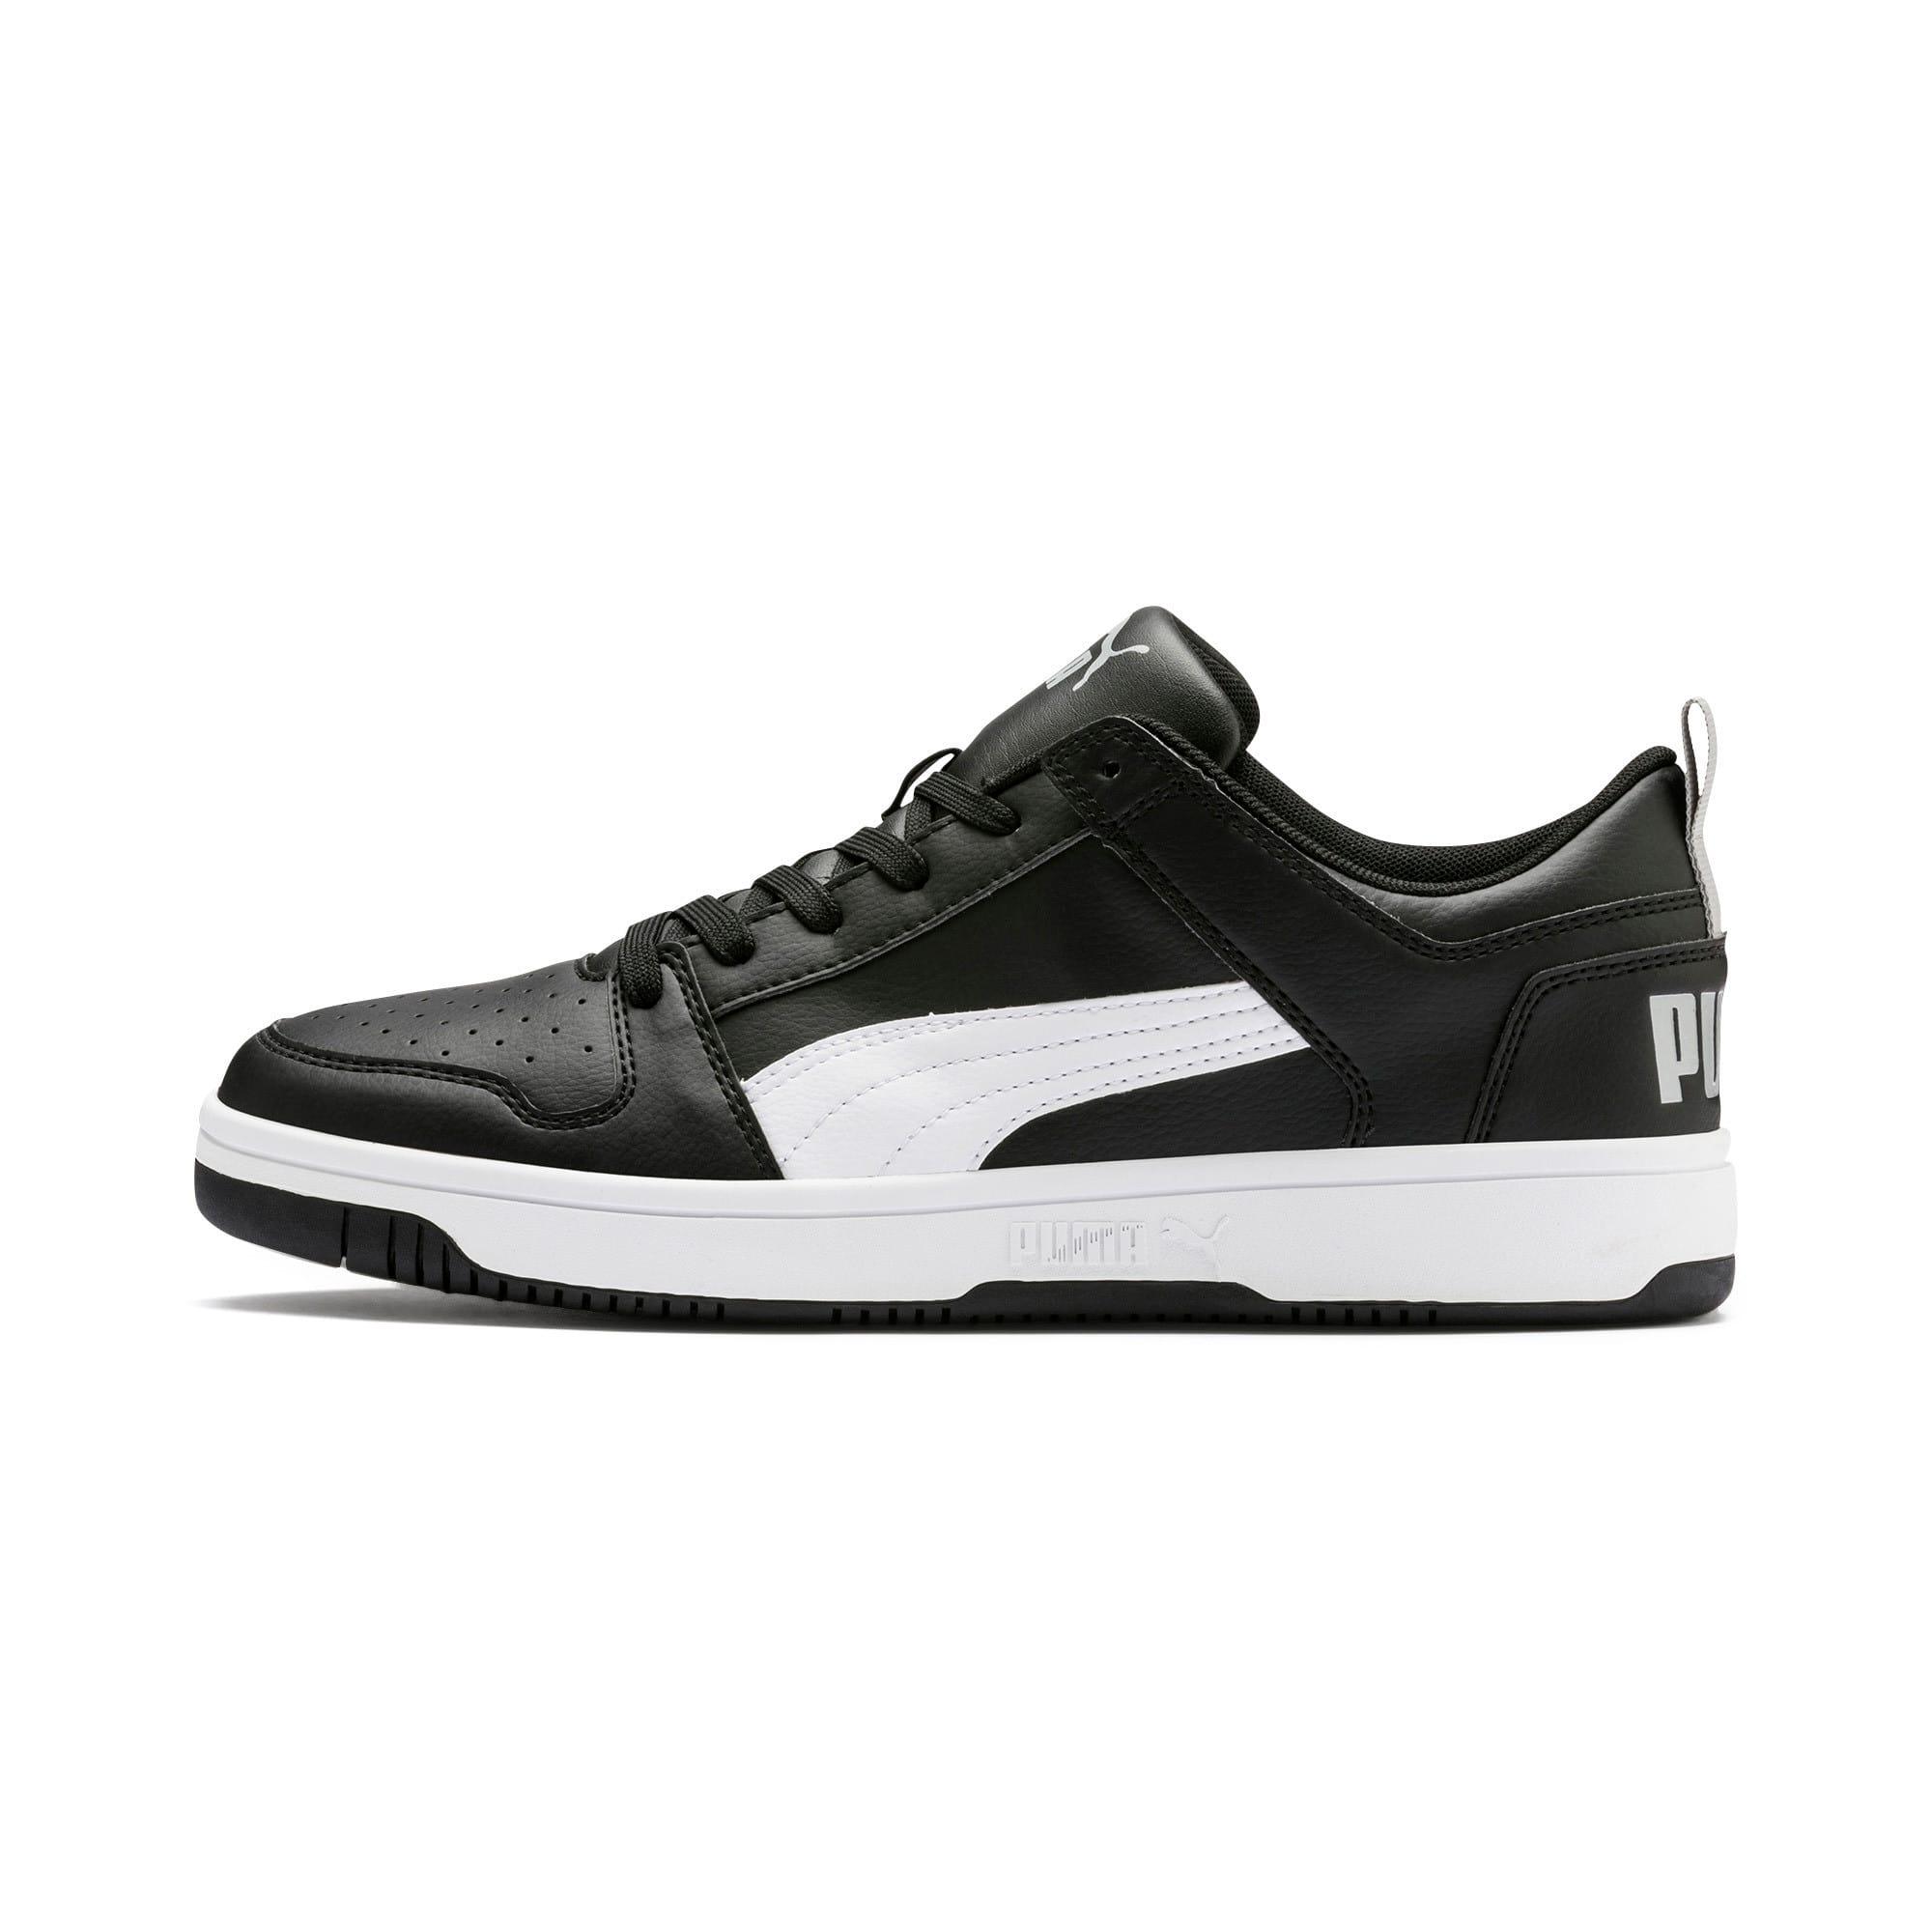 Thumbnail 1 of PUMA Rebound LayUp Lo Sneakers, Puma Black-White-High Rise, medium